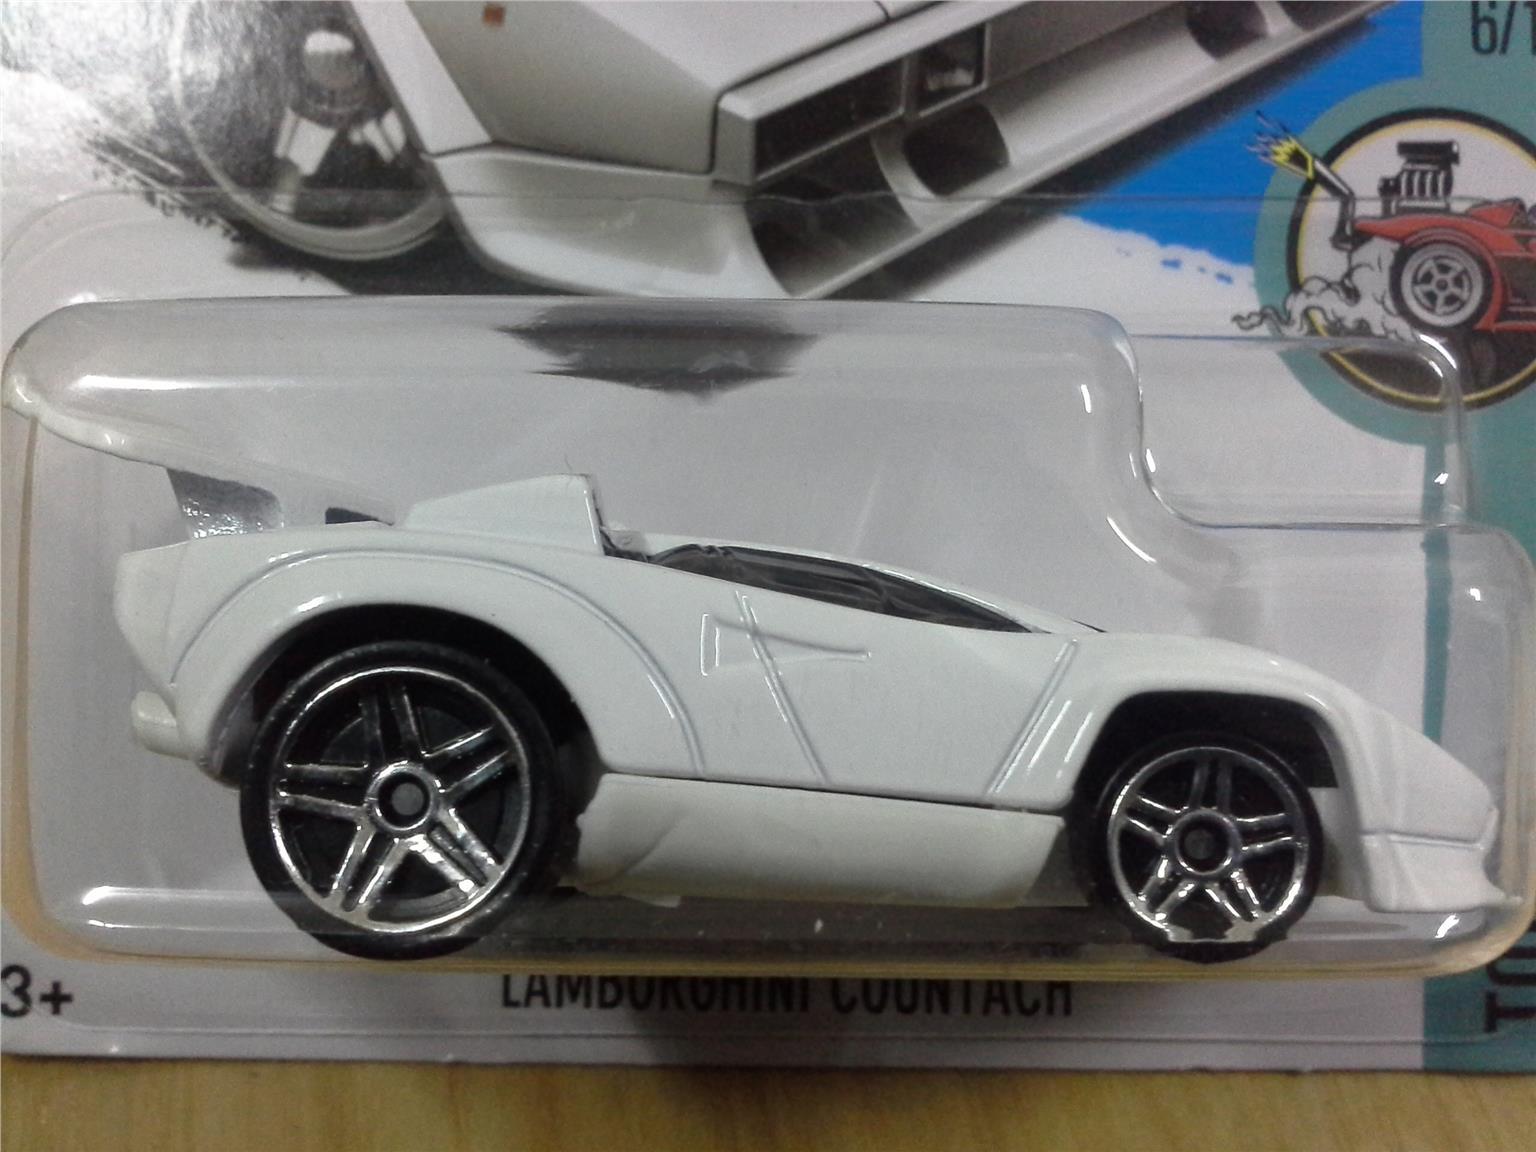 2017 Hot Wheels Lamborghini Countach End 3 2 2018 9 15 Pm